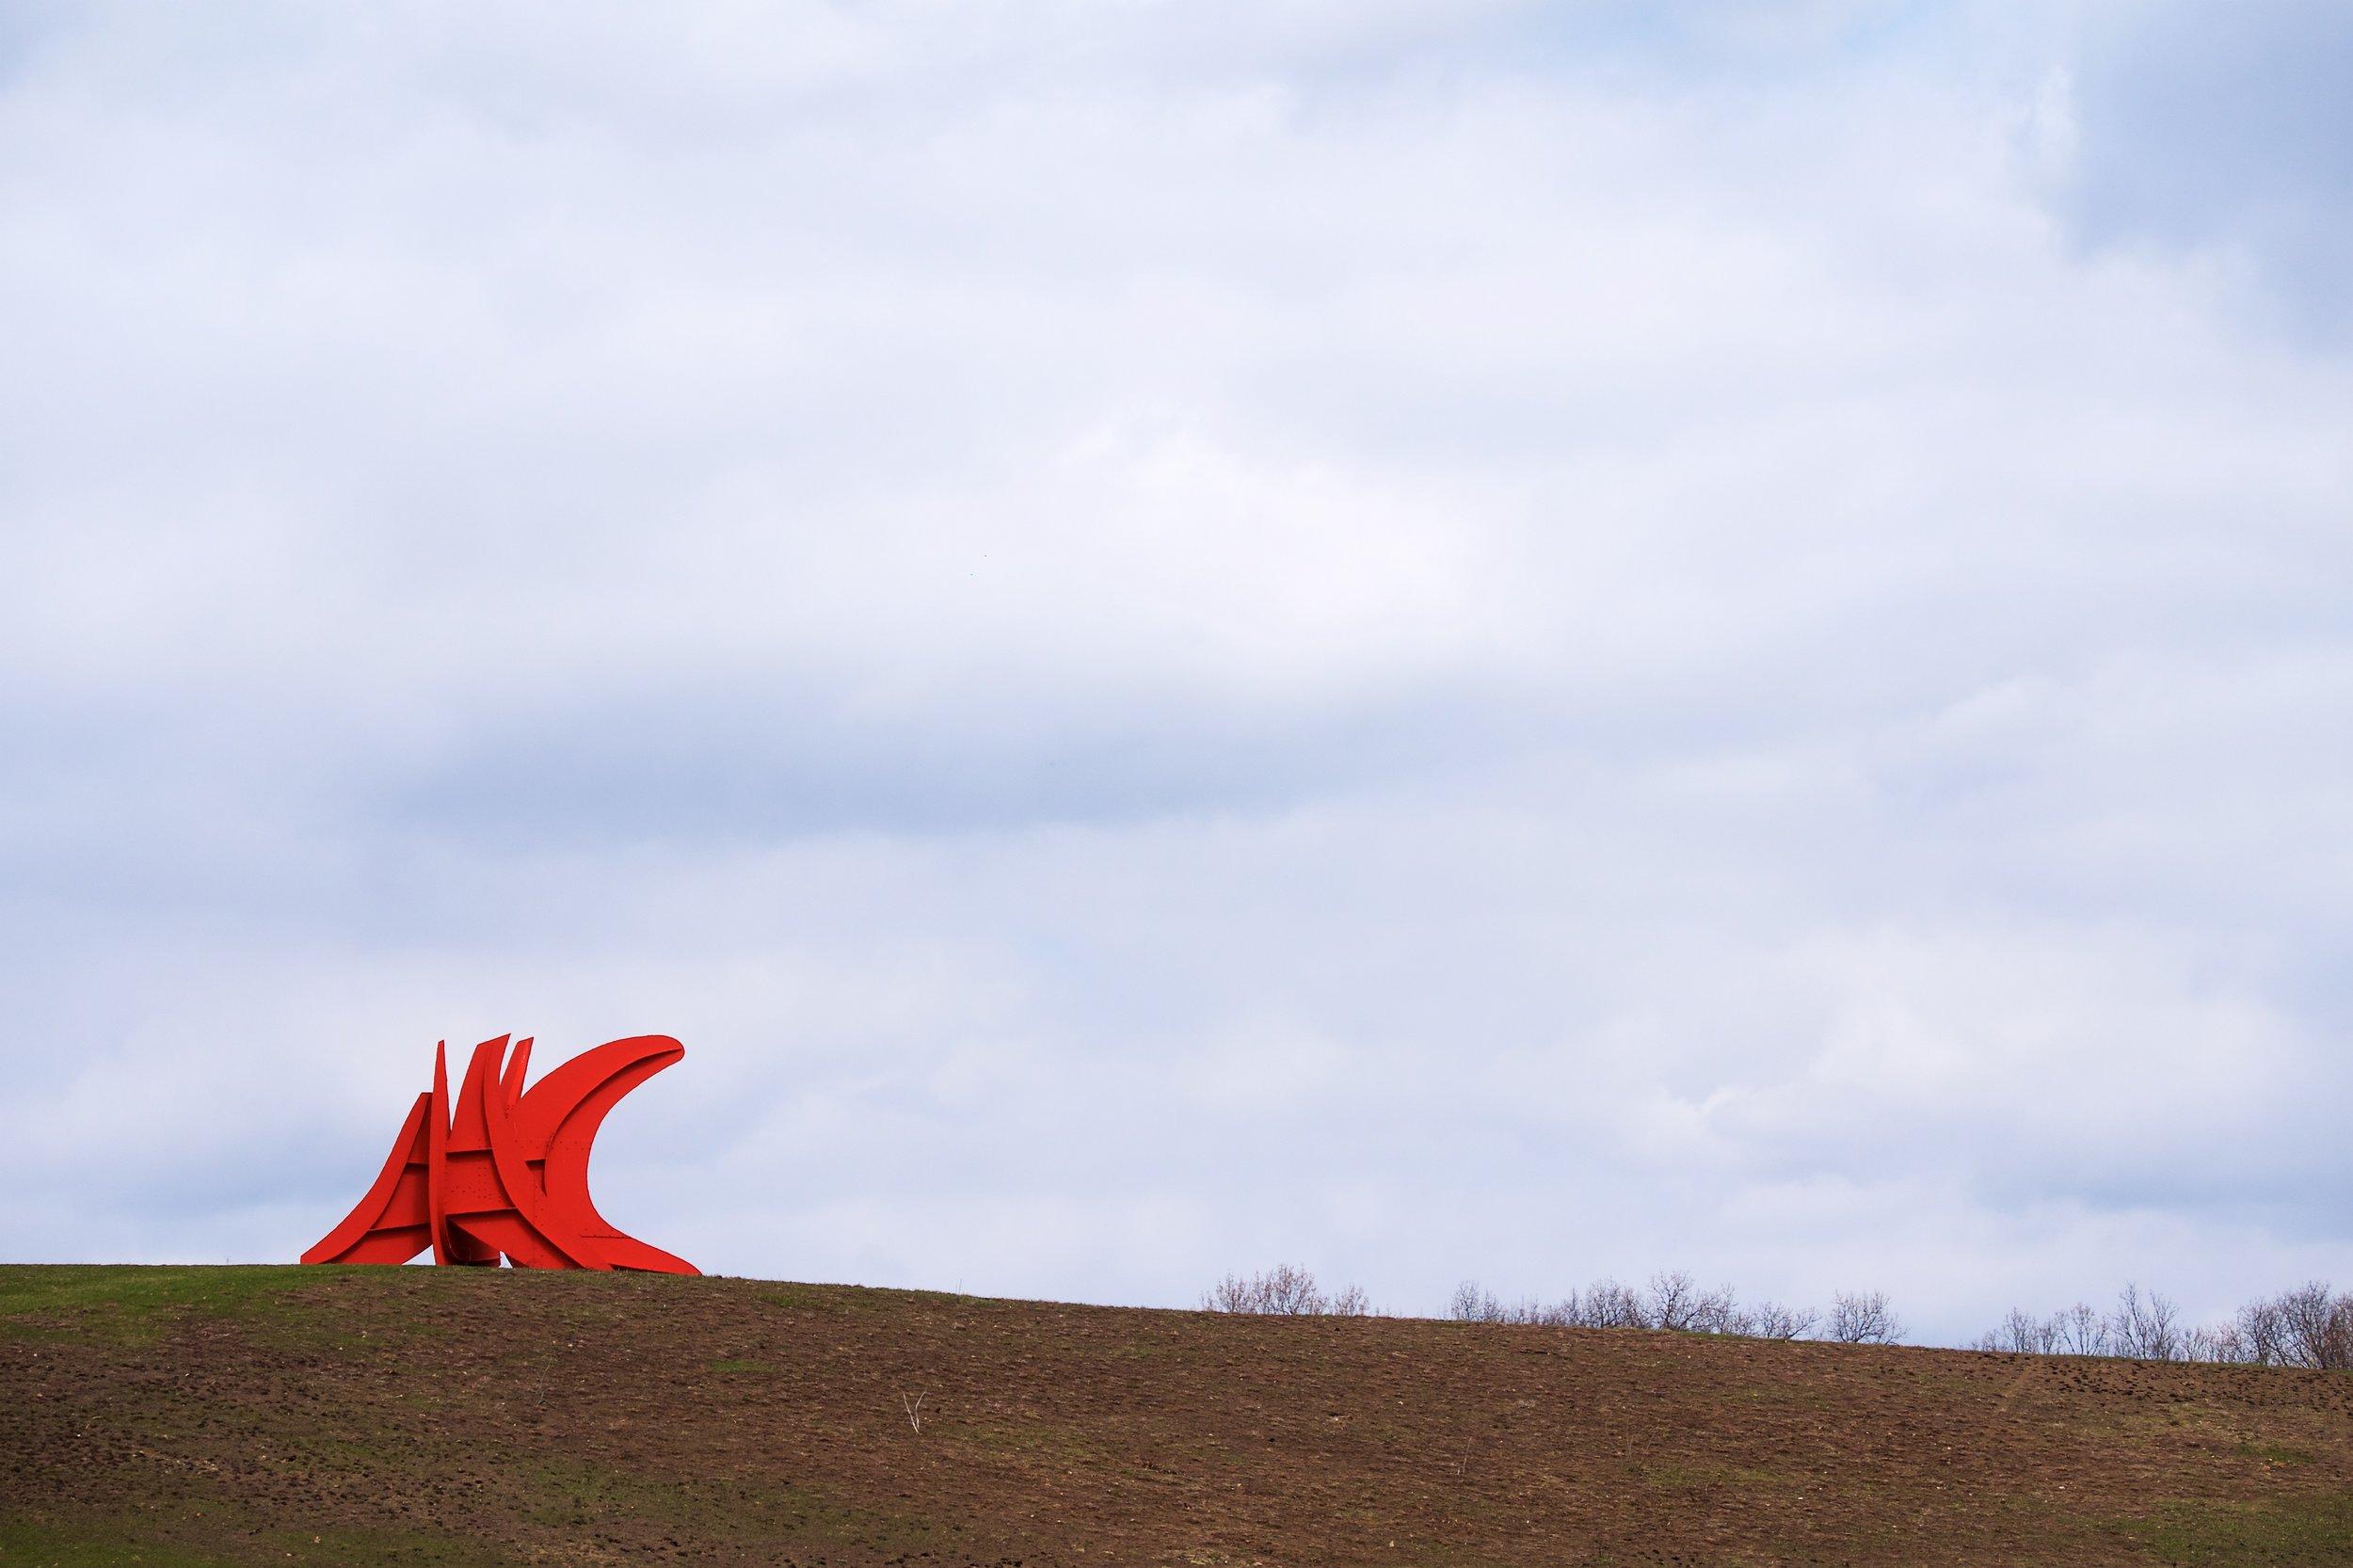 Five Swords, Alexander Calder